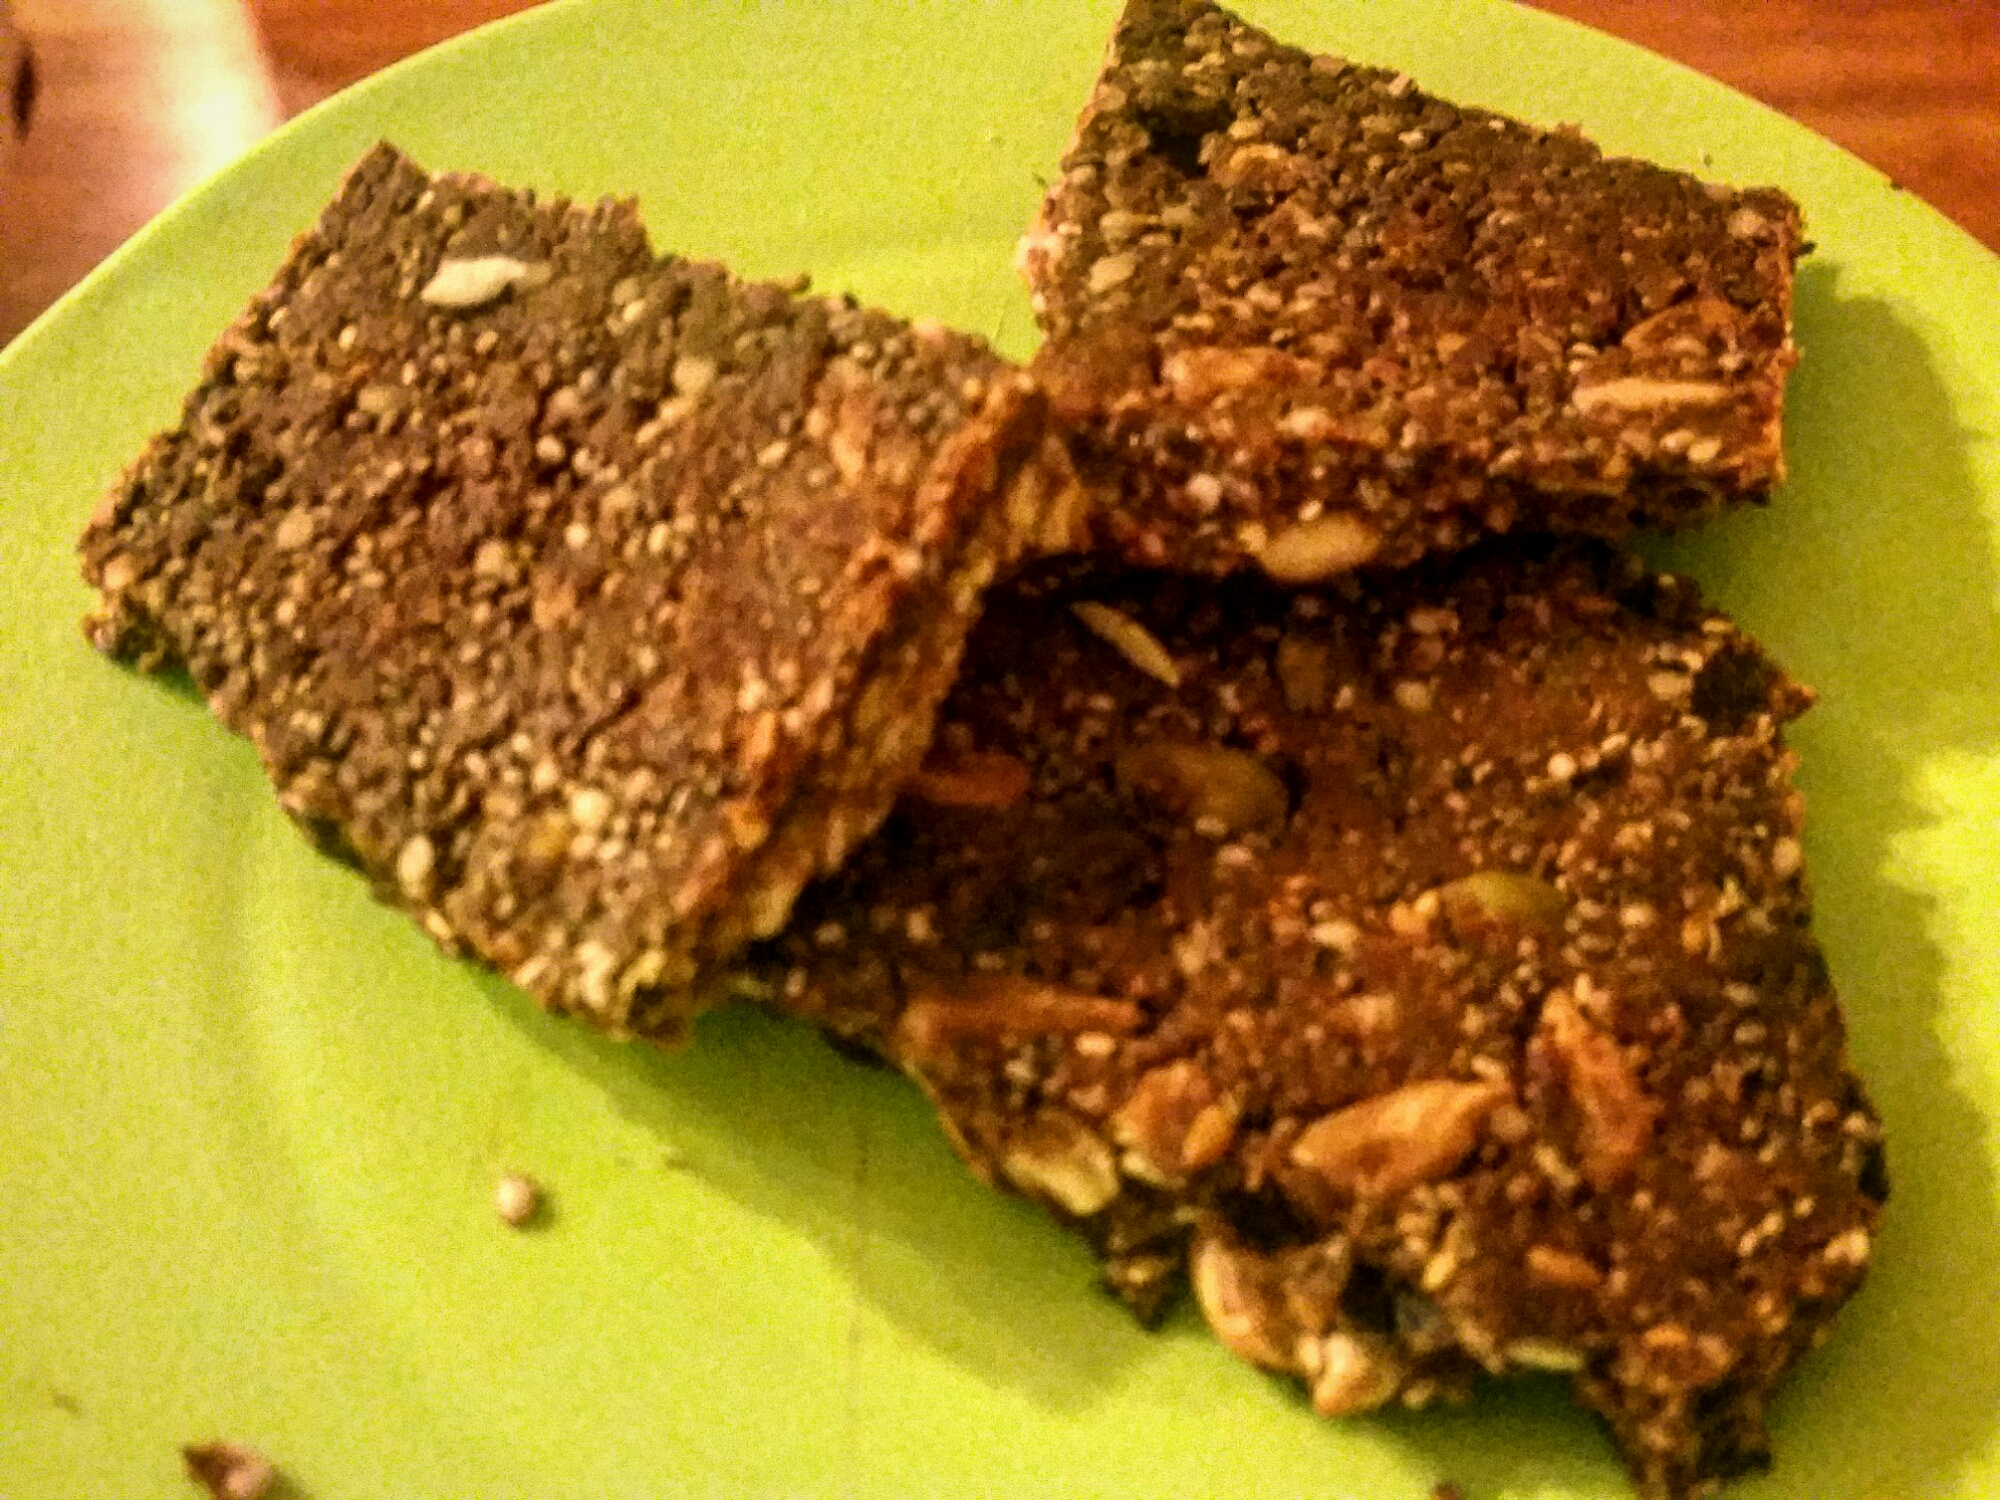 - Seedy Chocolate Coconut Butter Bars (Paleo, Vegan)